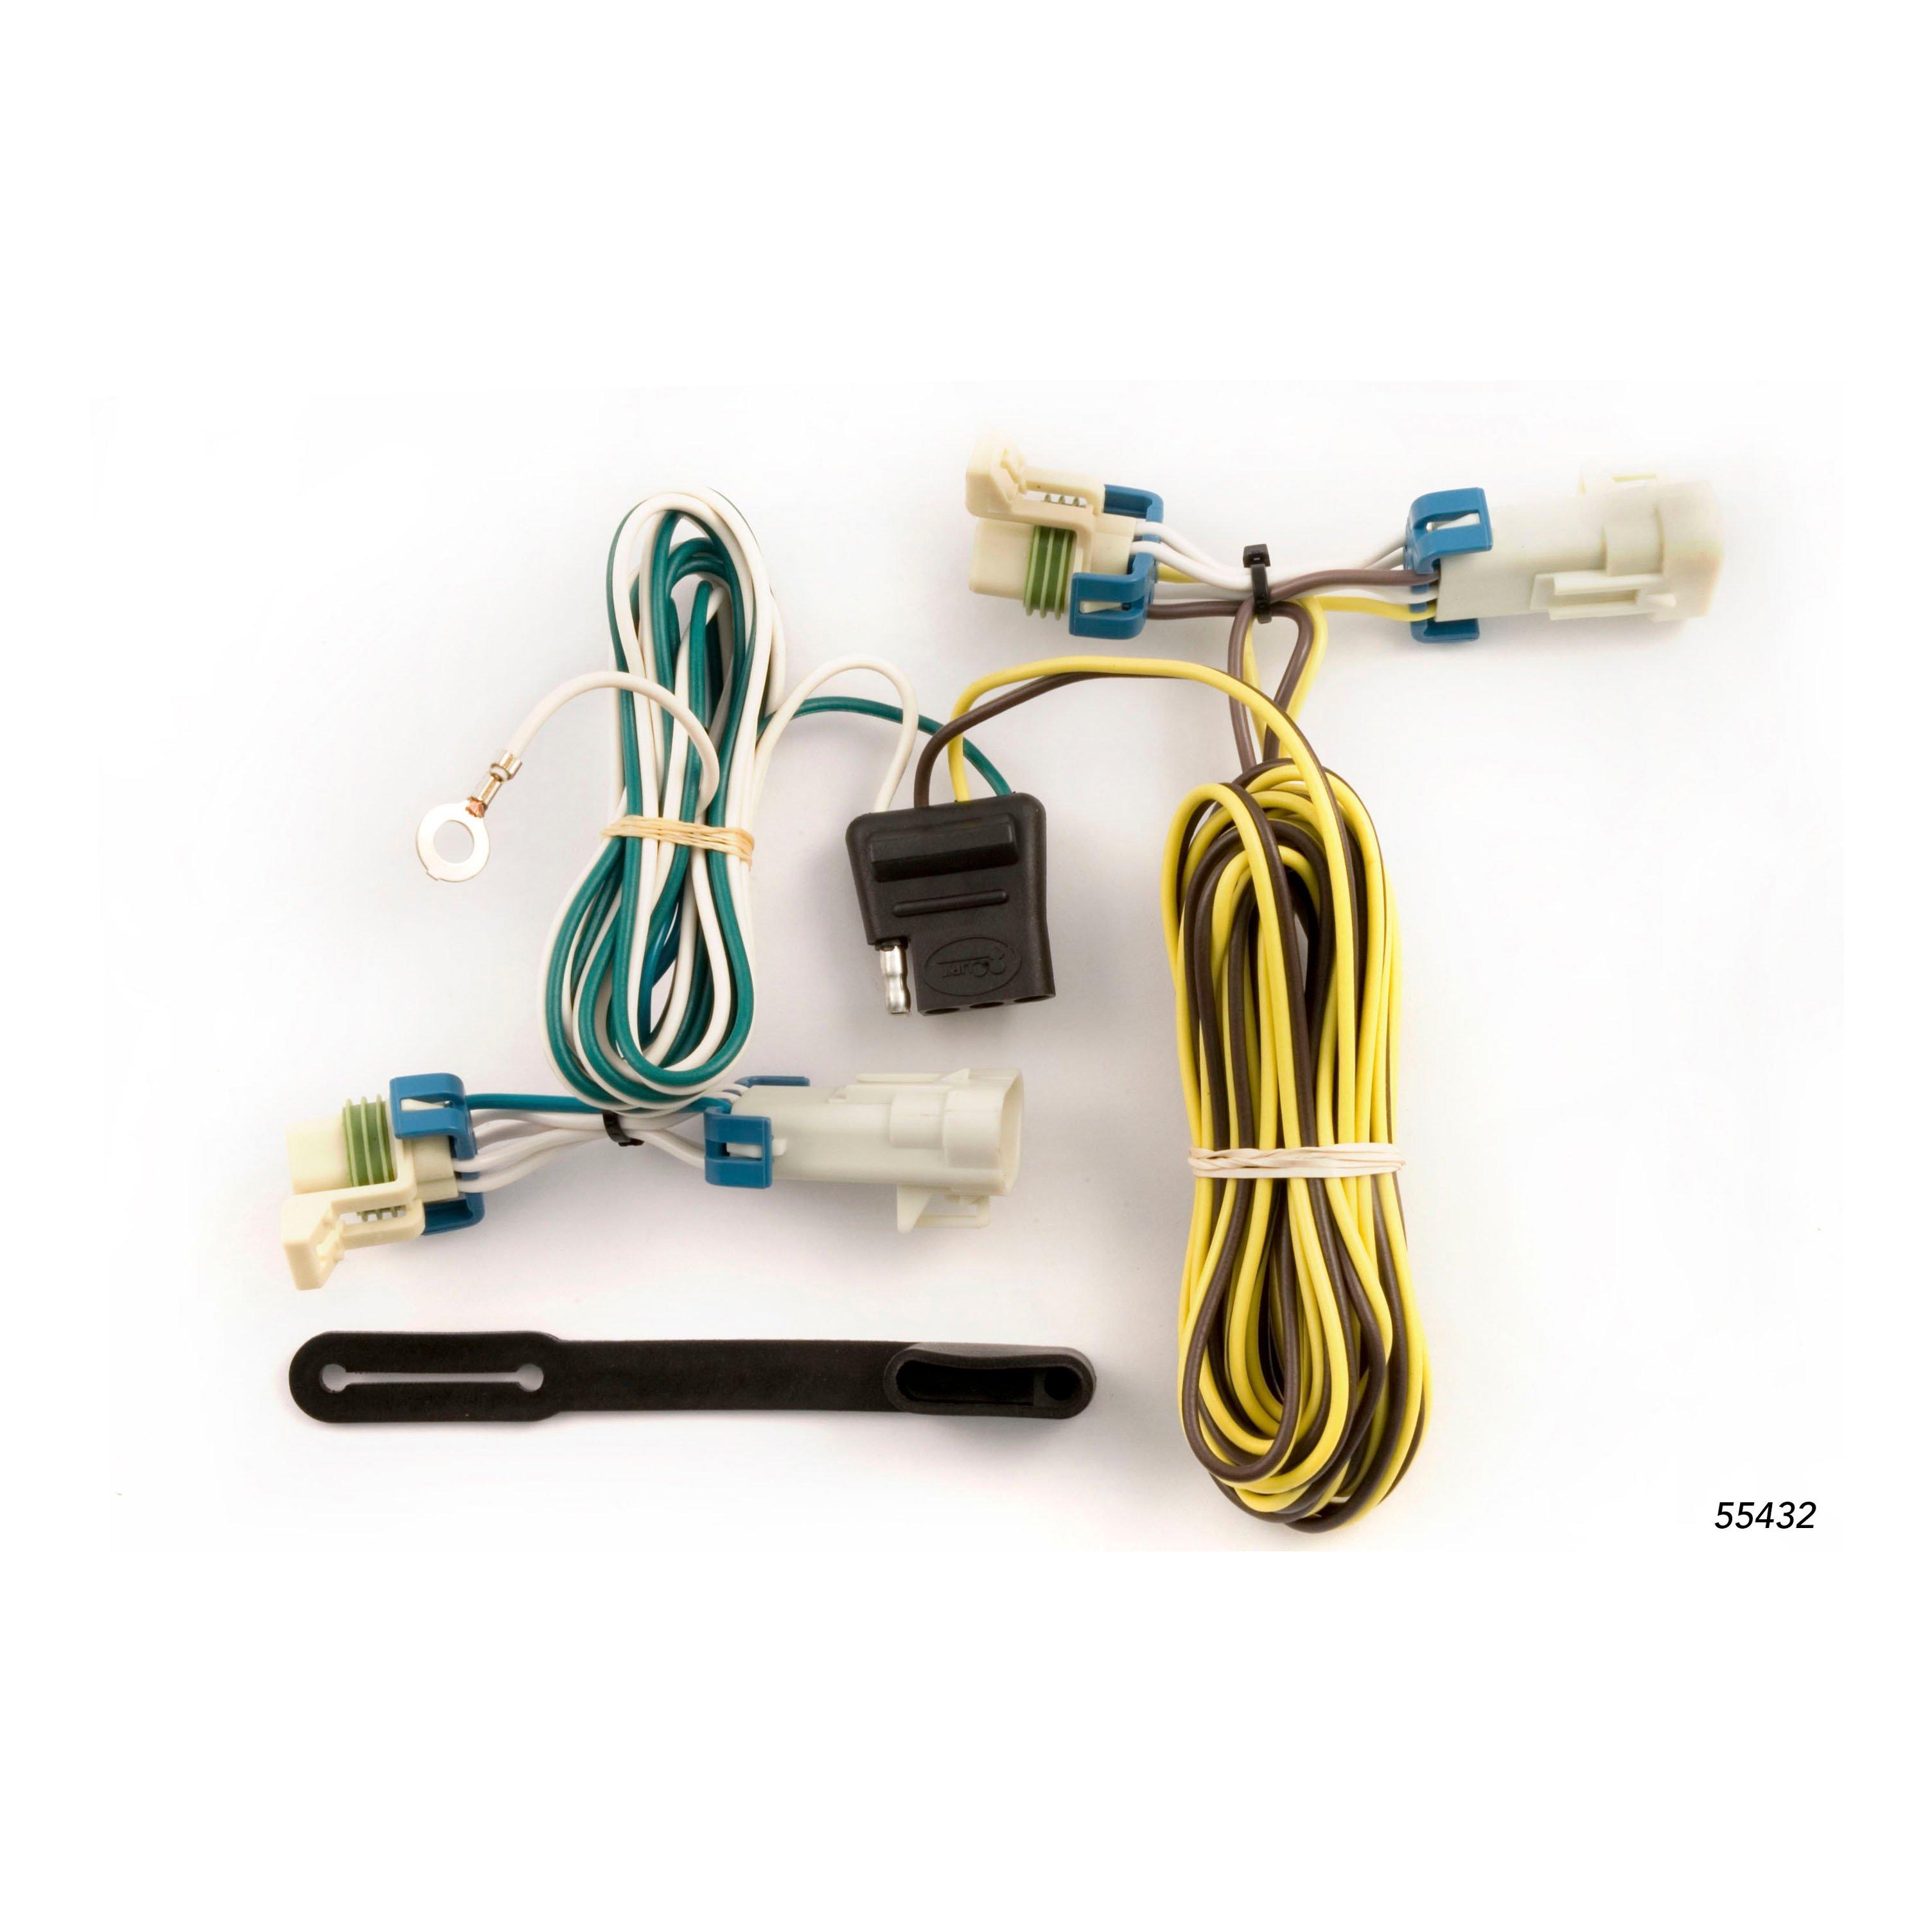 Curt Class 1 Trailer Hitch Wiring For Chevrolet Cobalt Hhr 2009 Lt Radio Harness Amp